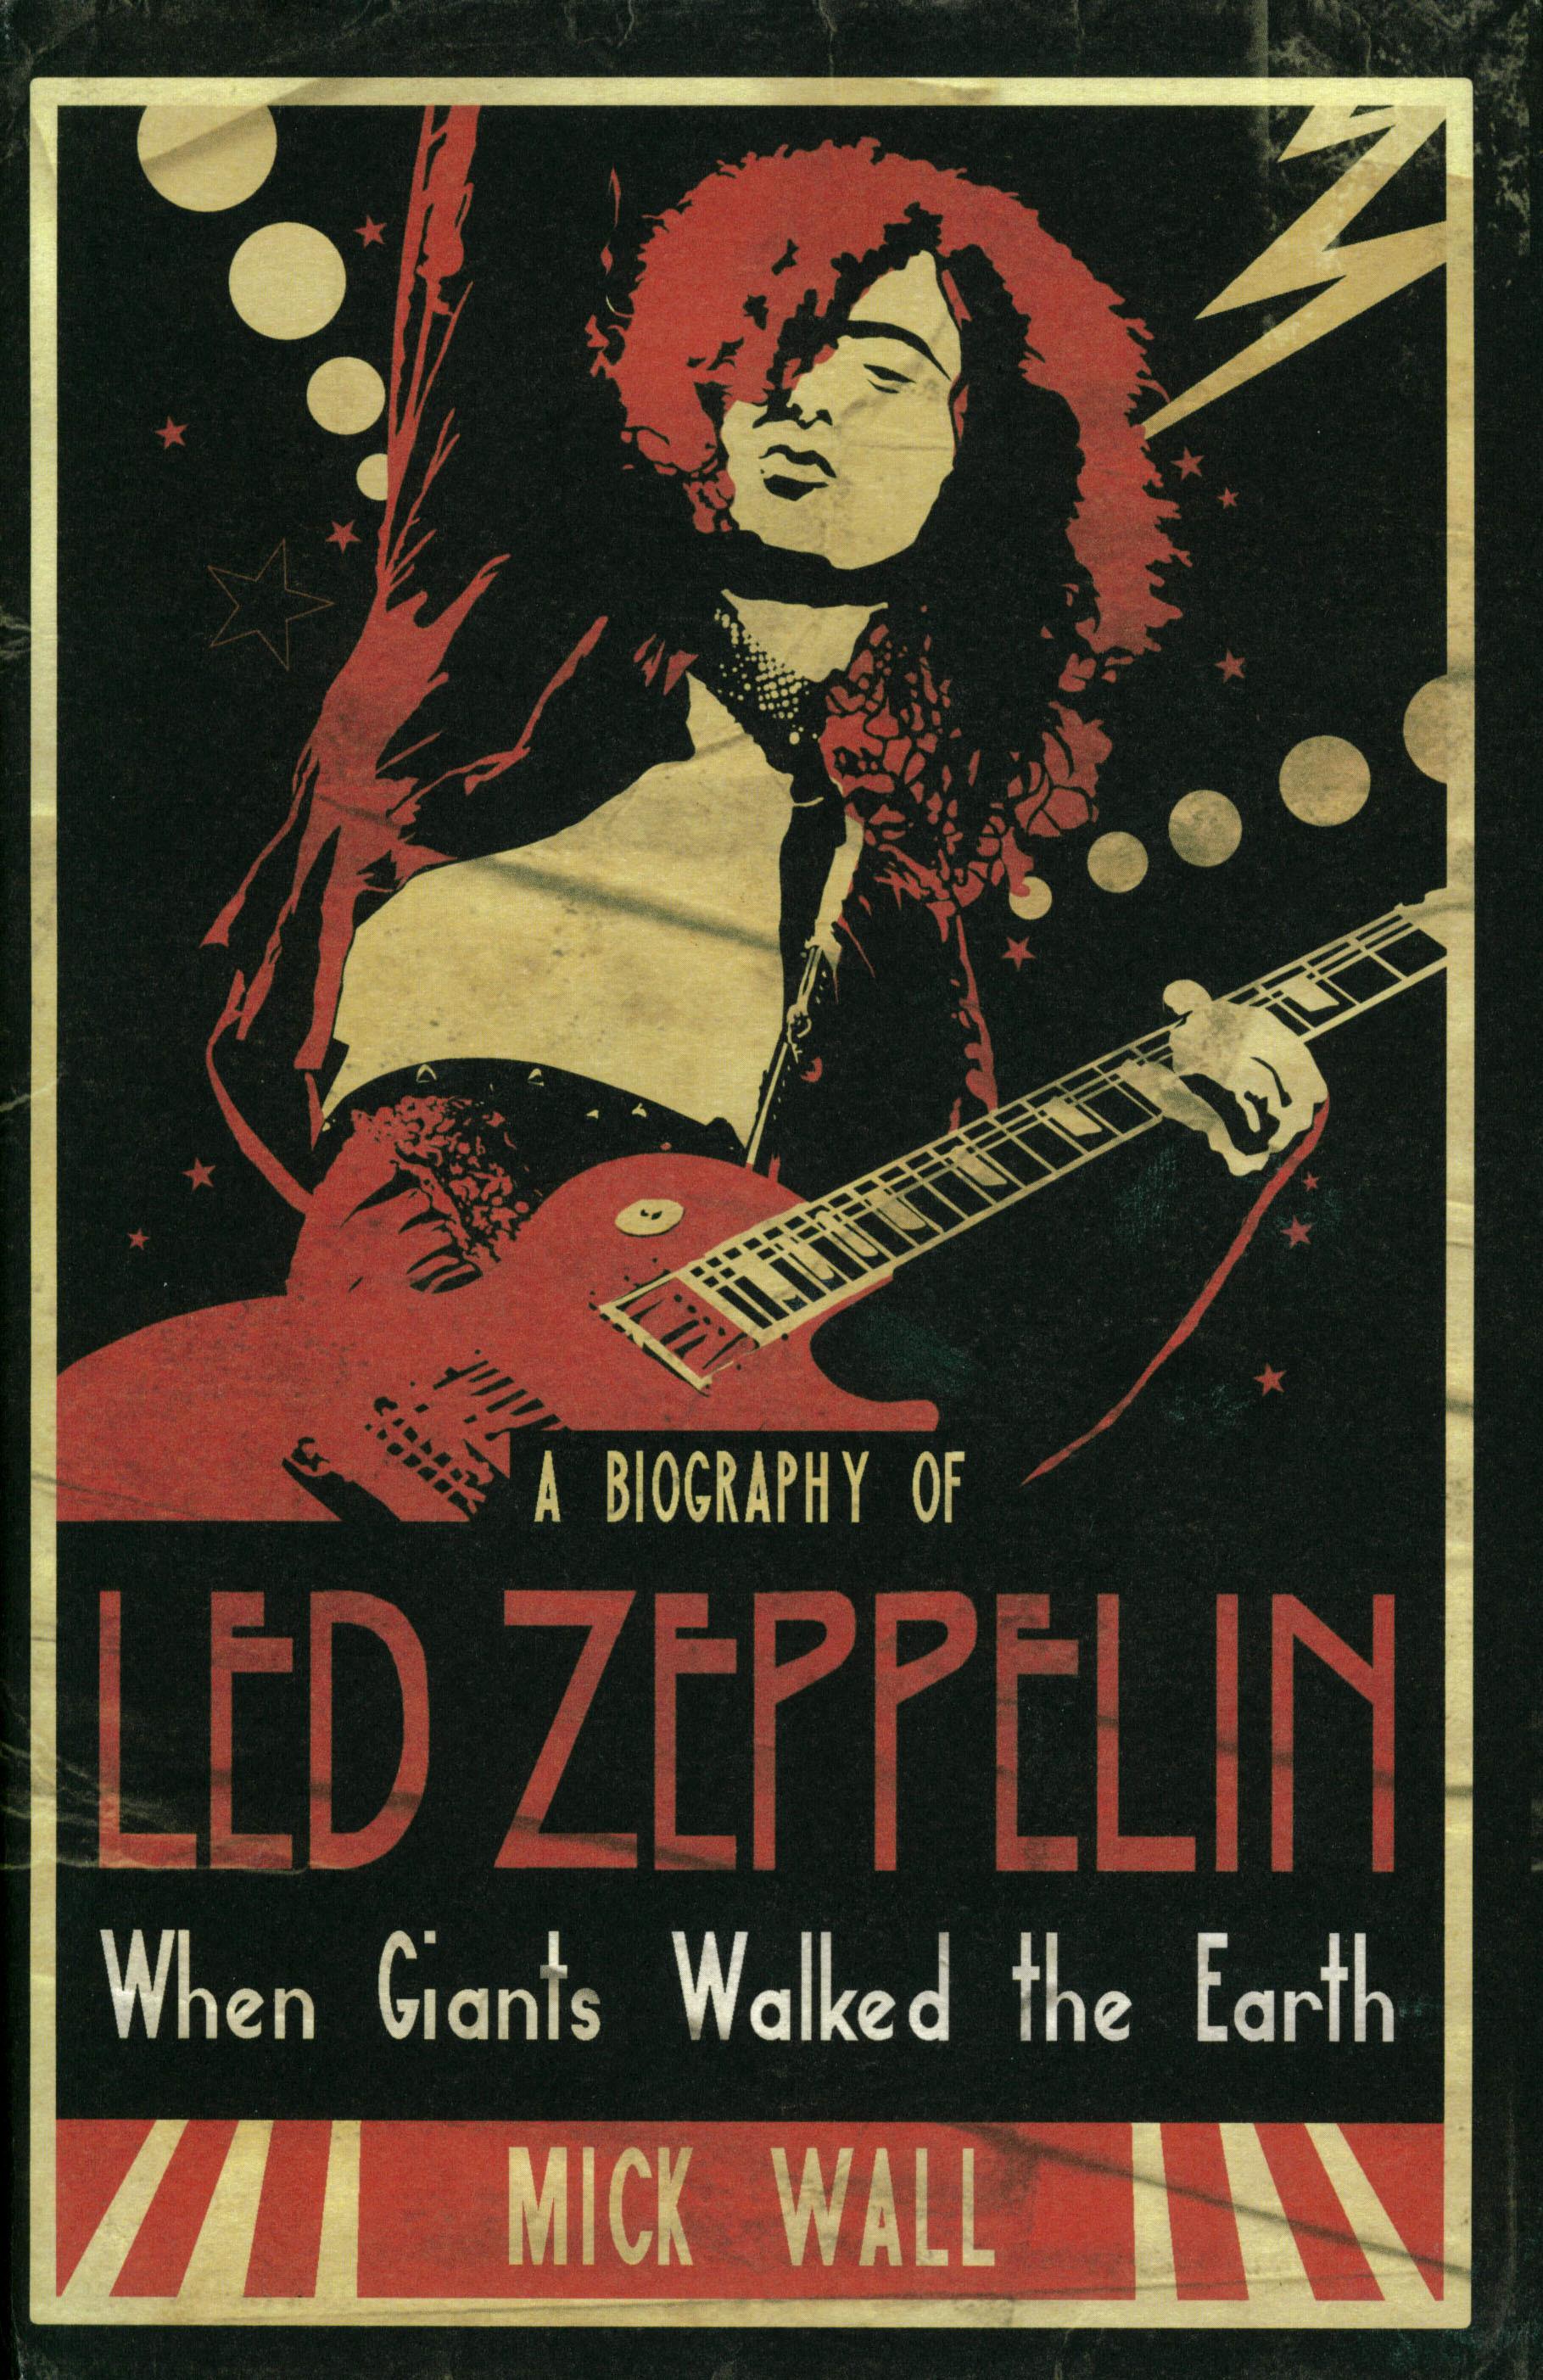 Led Zeppelin Iphone Wallpaper 46 Images